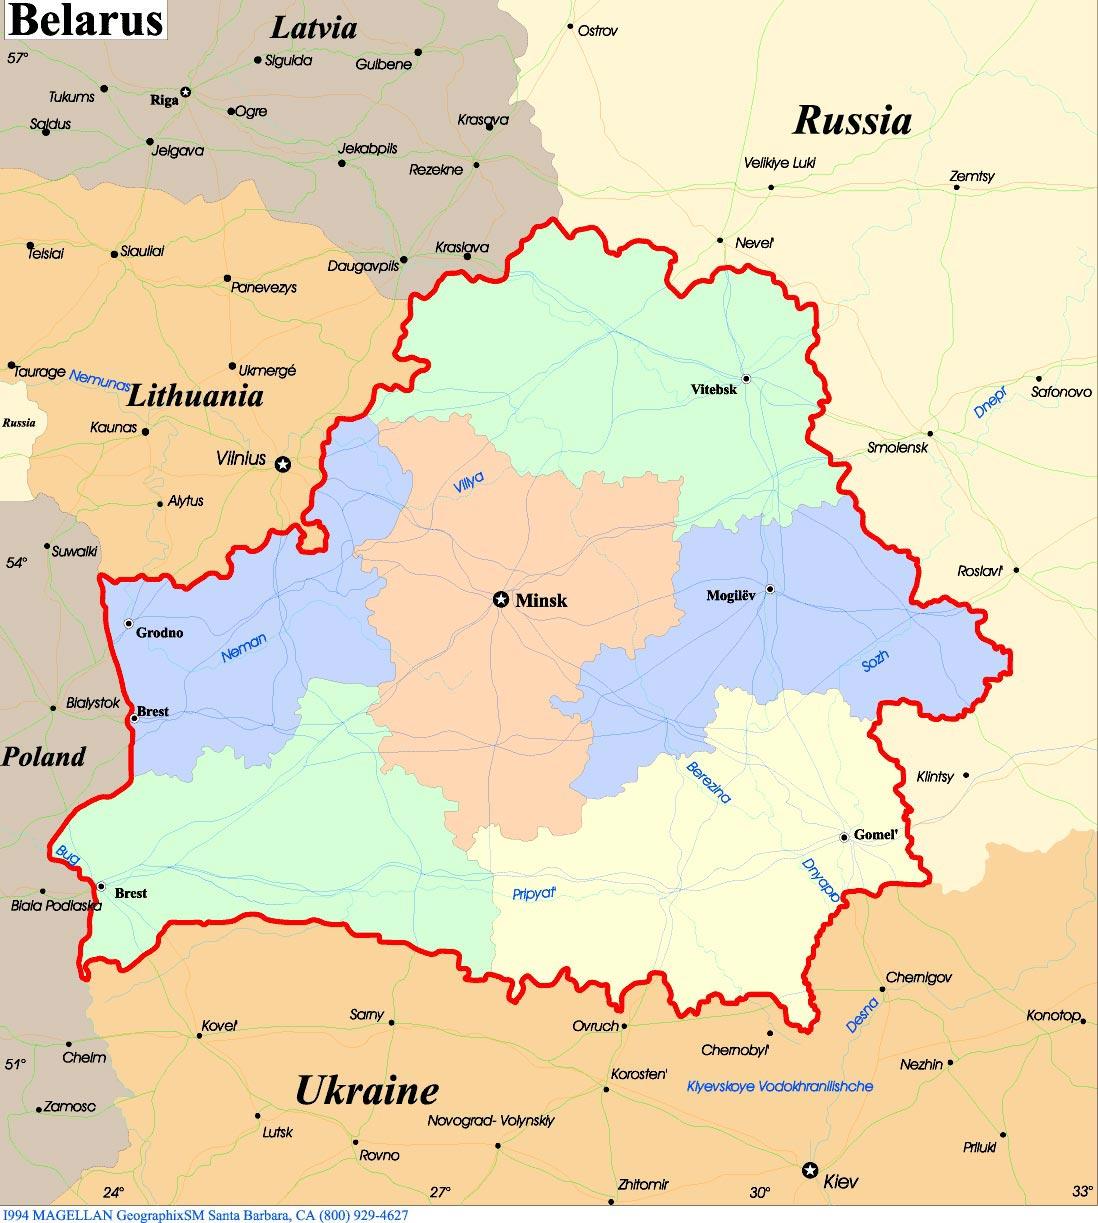 Belarus Maps Printable Maps of Belarus for Download